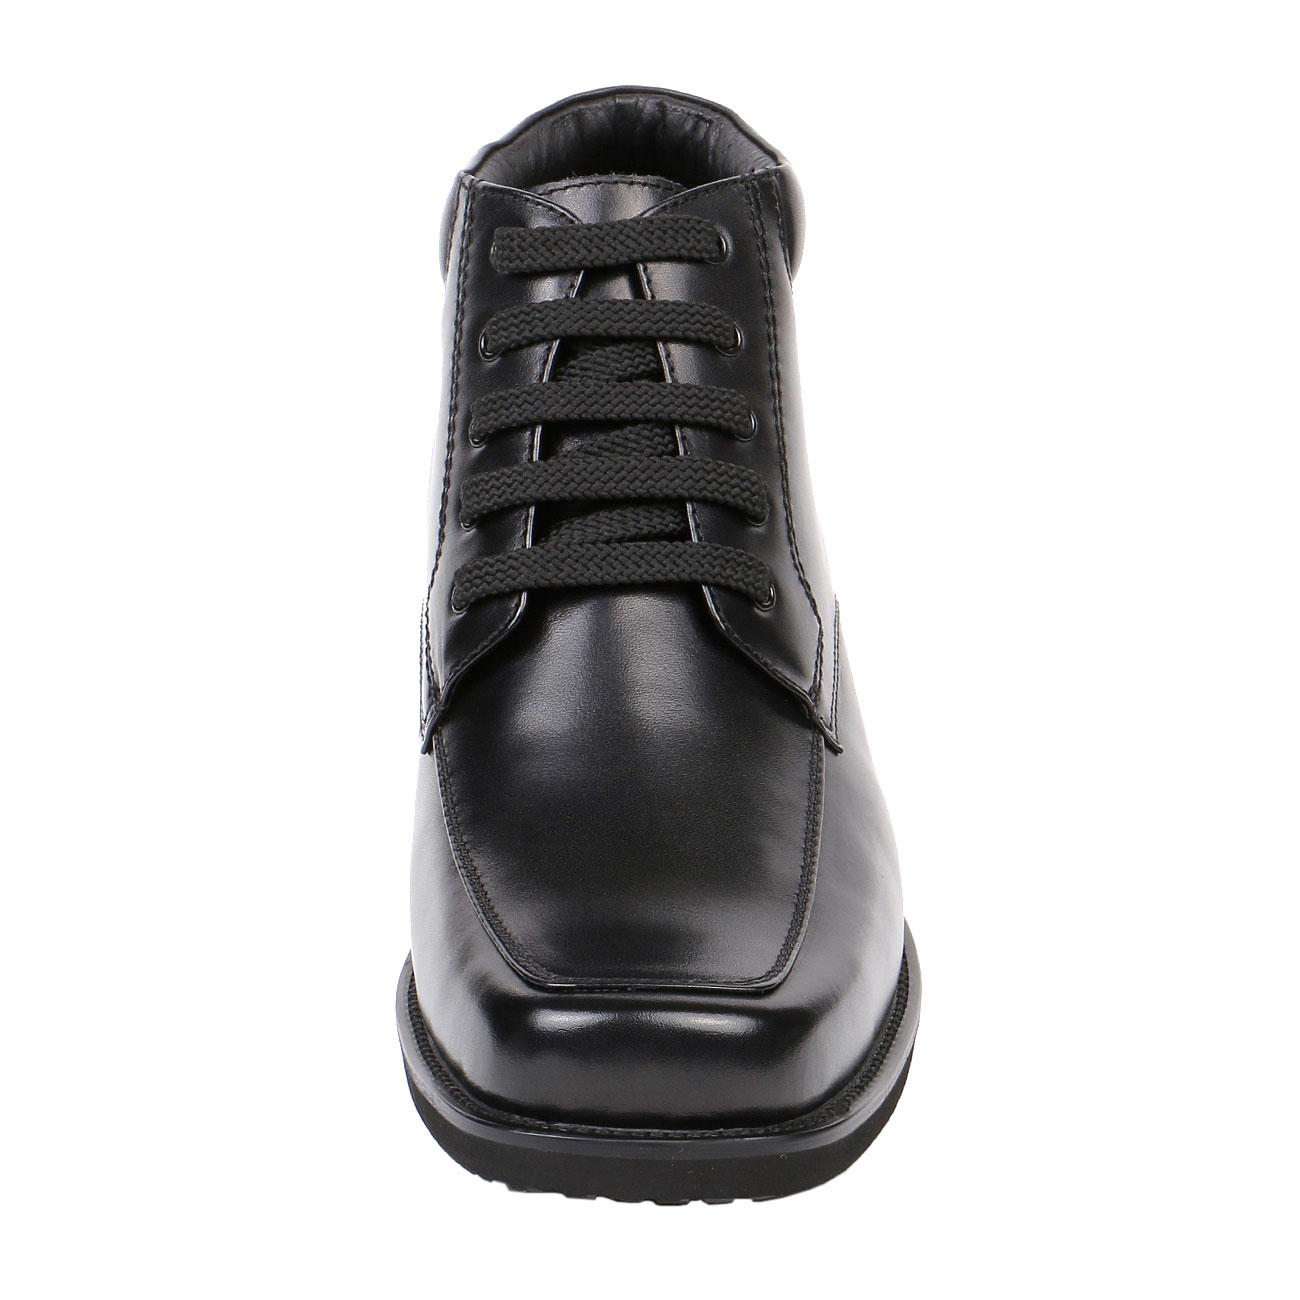 Comfort Elevator Walk Boots 4